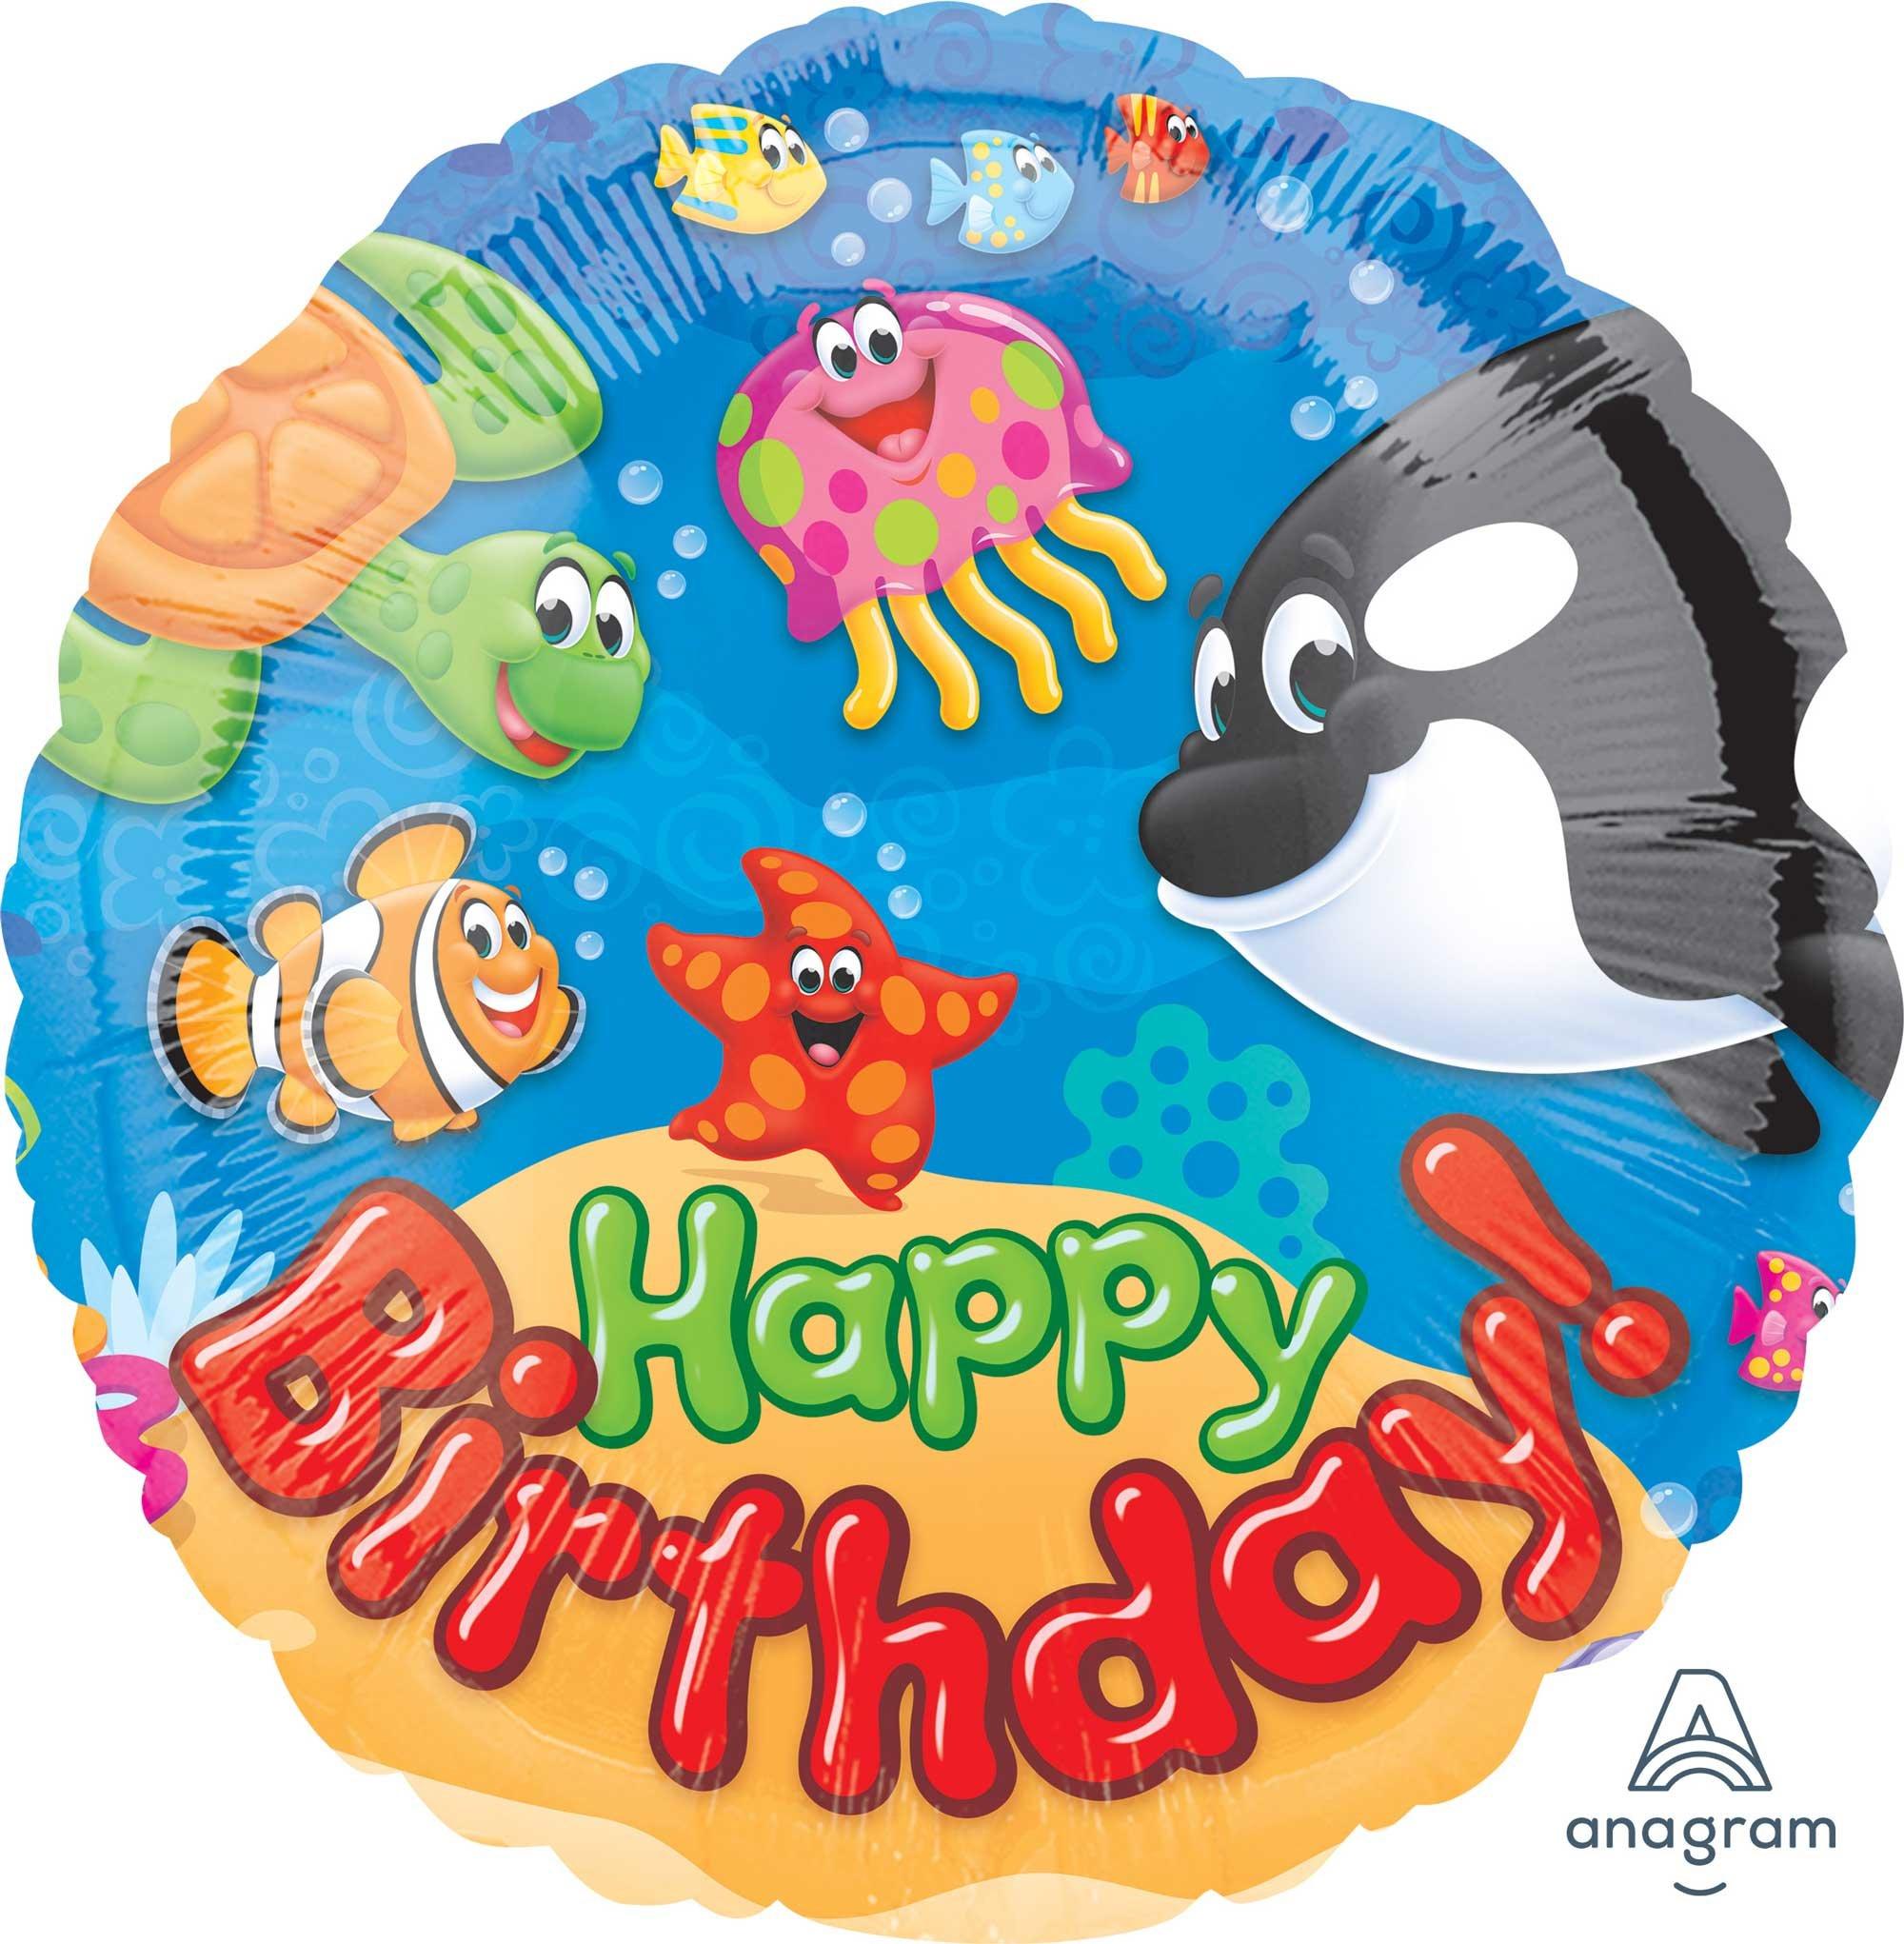 45cm Standard HX Trend Sea Buddies Happy Birthday S40